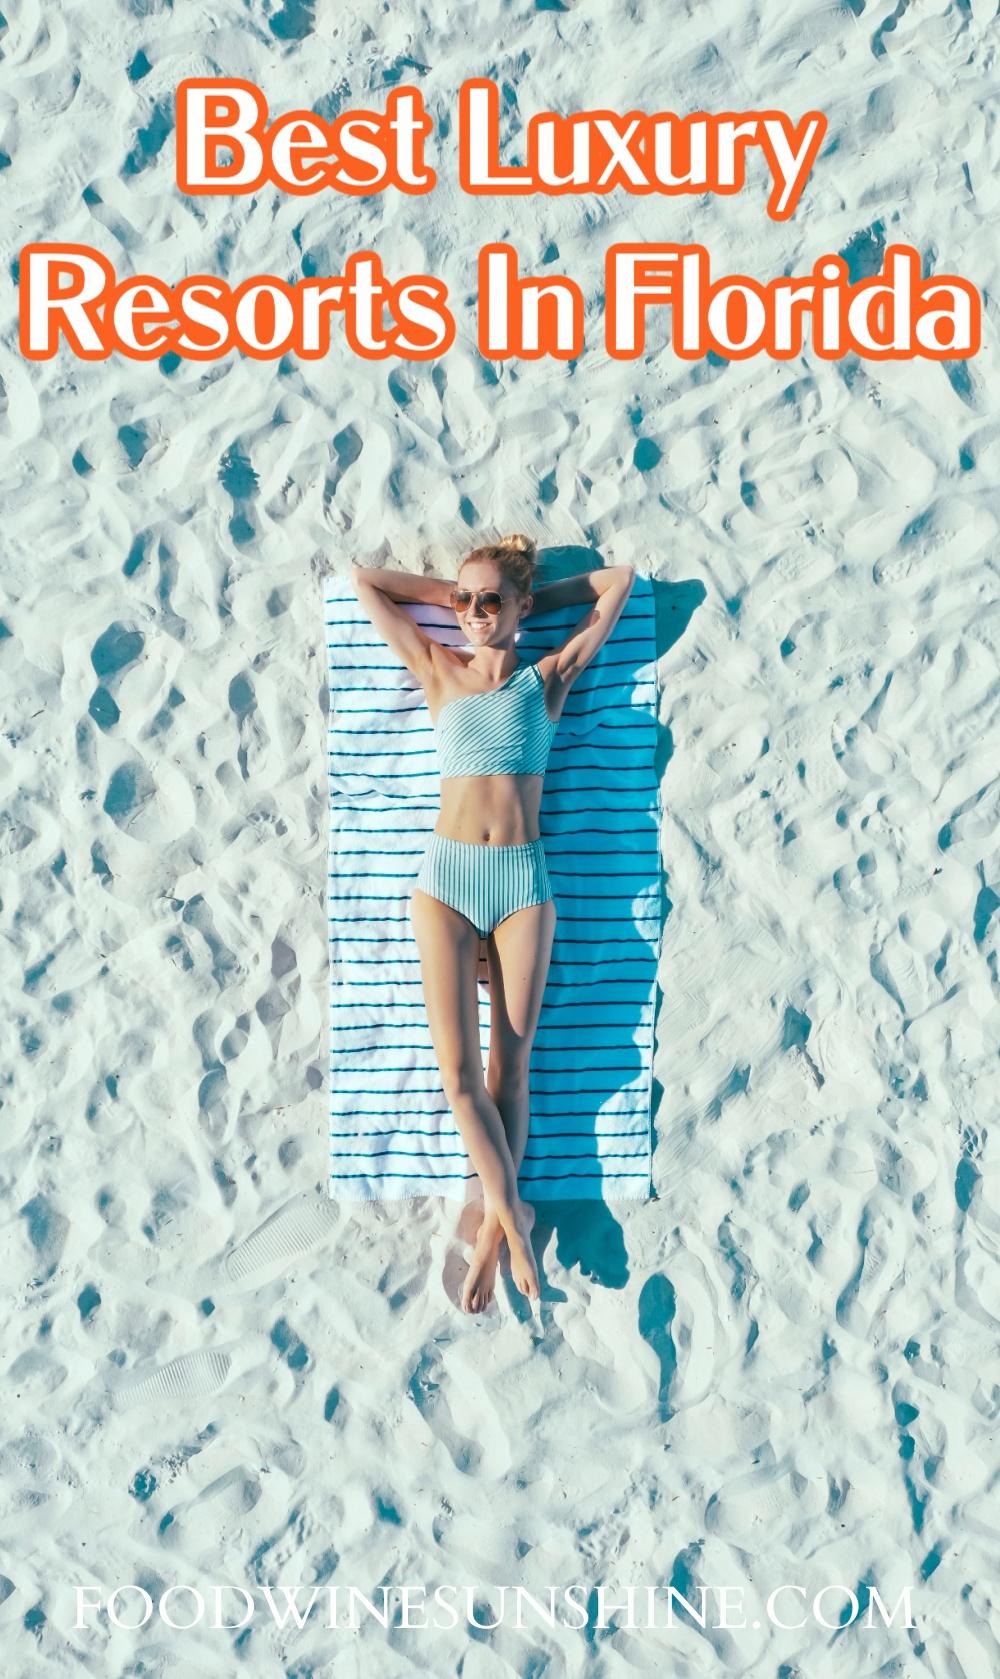 Best Luxury Resorts In Florida